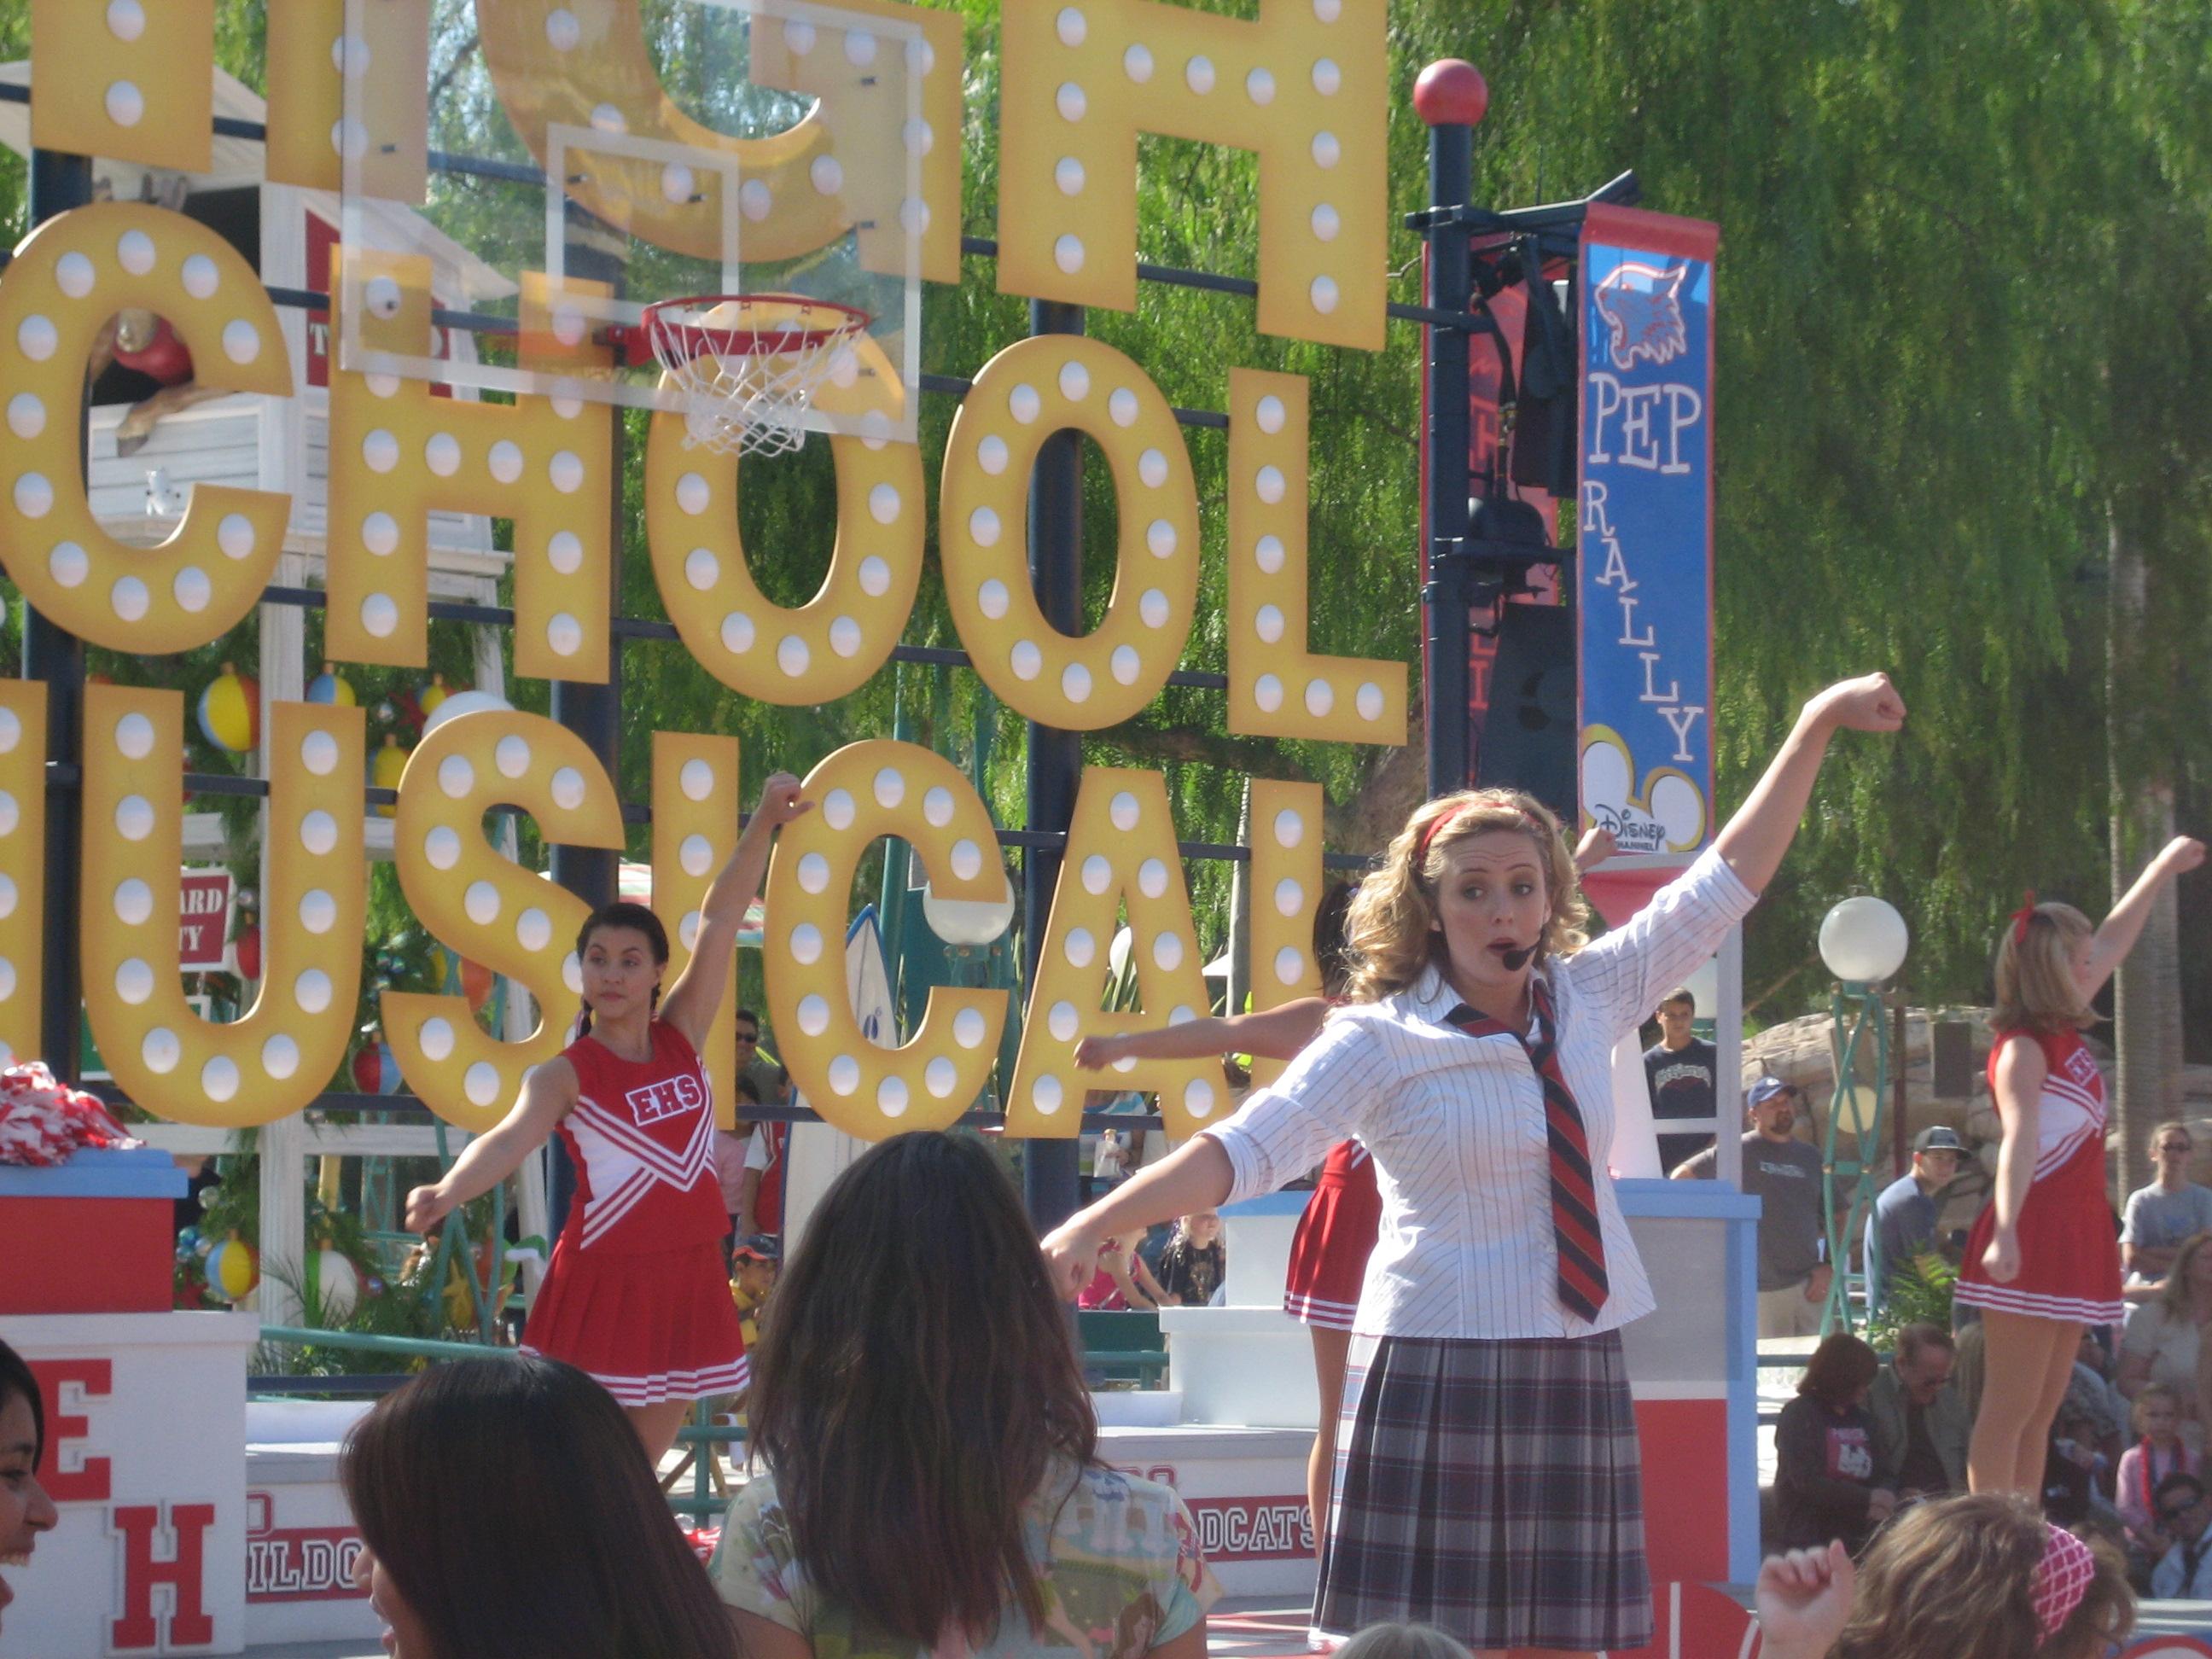 File:HighSchoolMusical parade.jpg - Wikimedia Commons Highschoolmusical